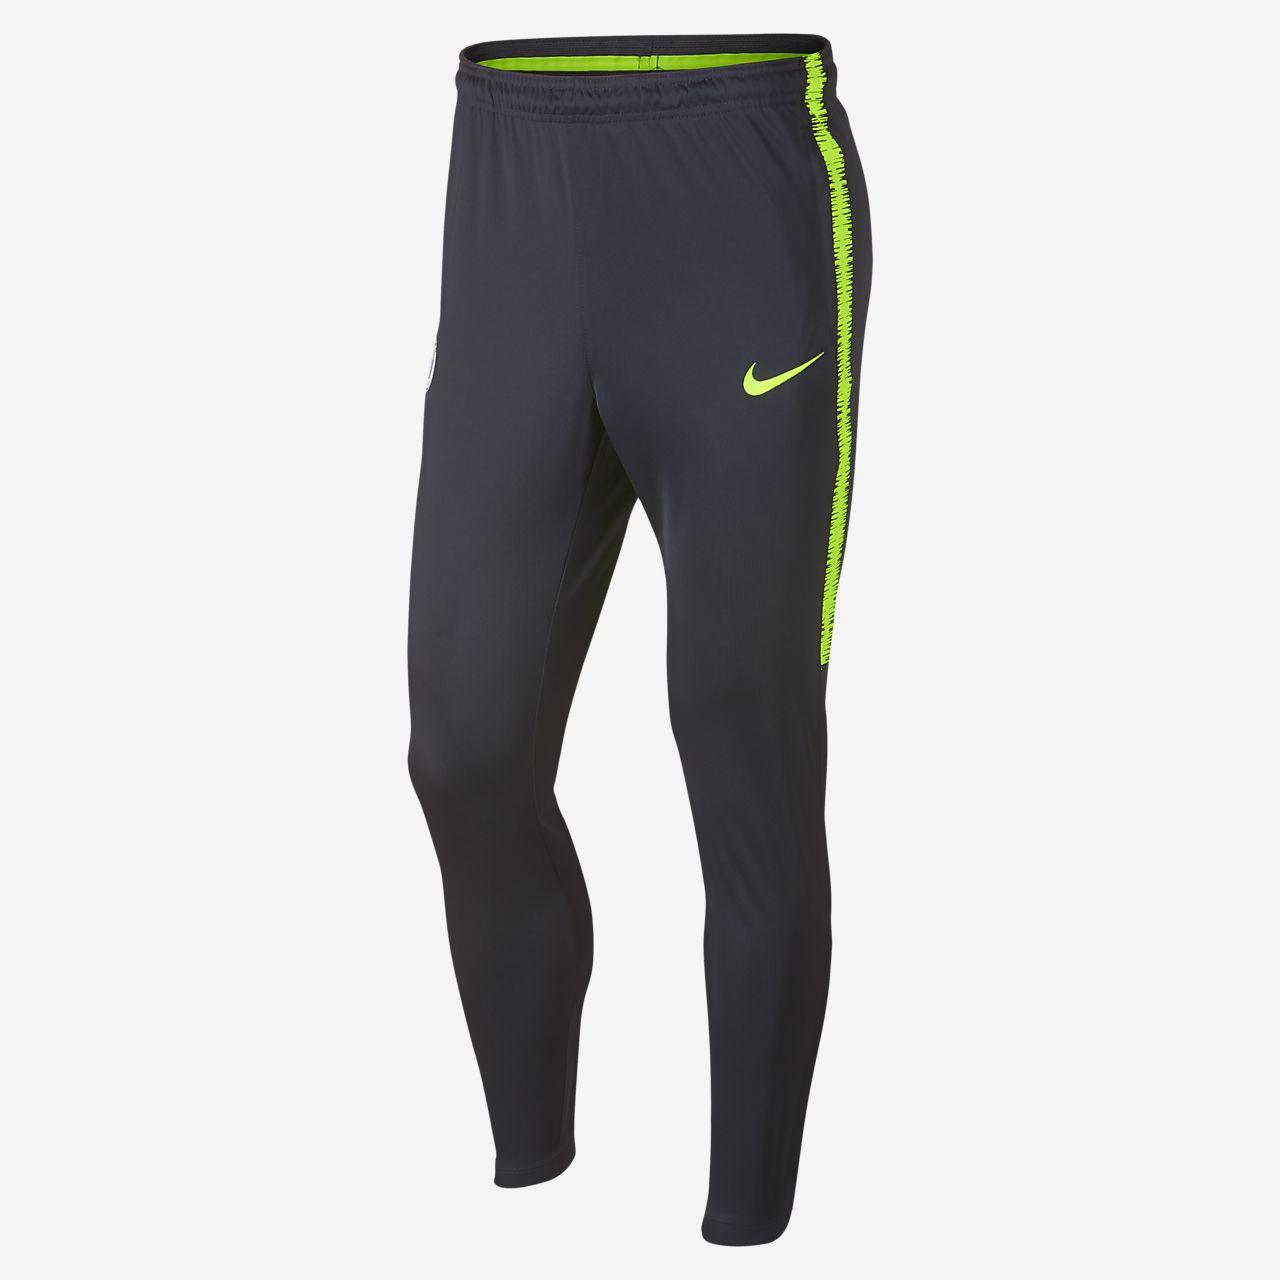 79ffd6b8ae2a Manchester City FC Dri-FIT Squad Men s Football Track Pants. Nike.com BG